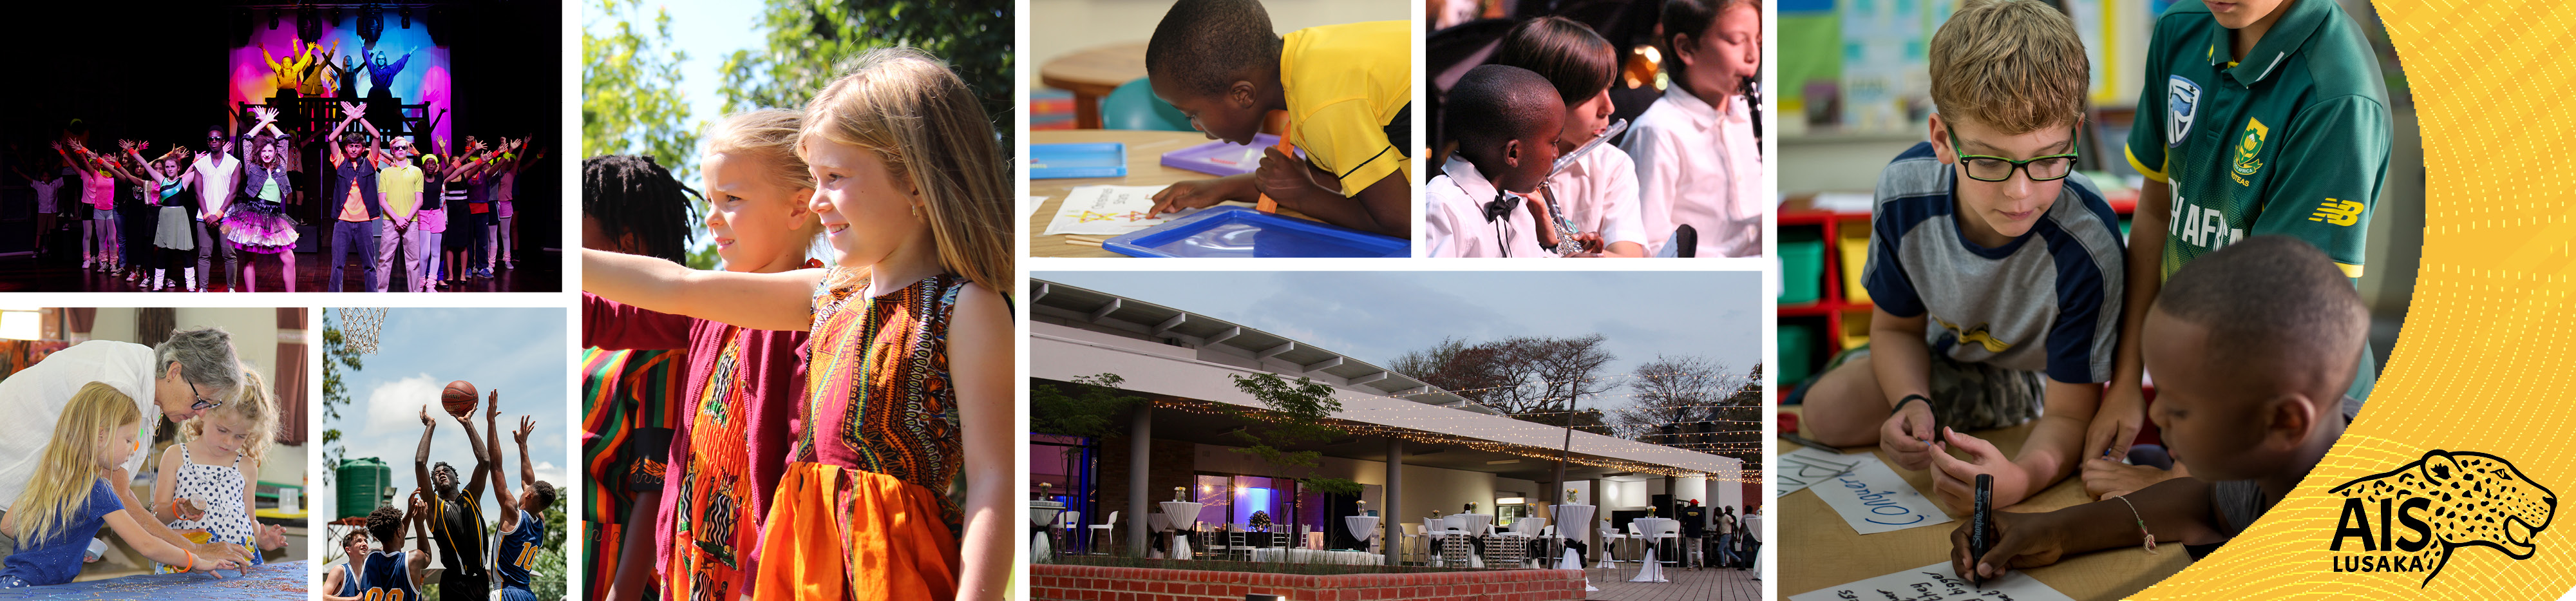 American International school Lusaka 12.